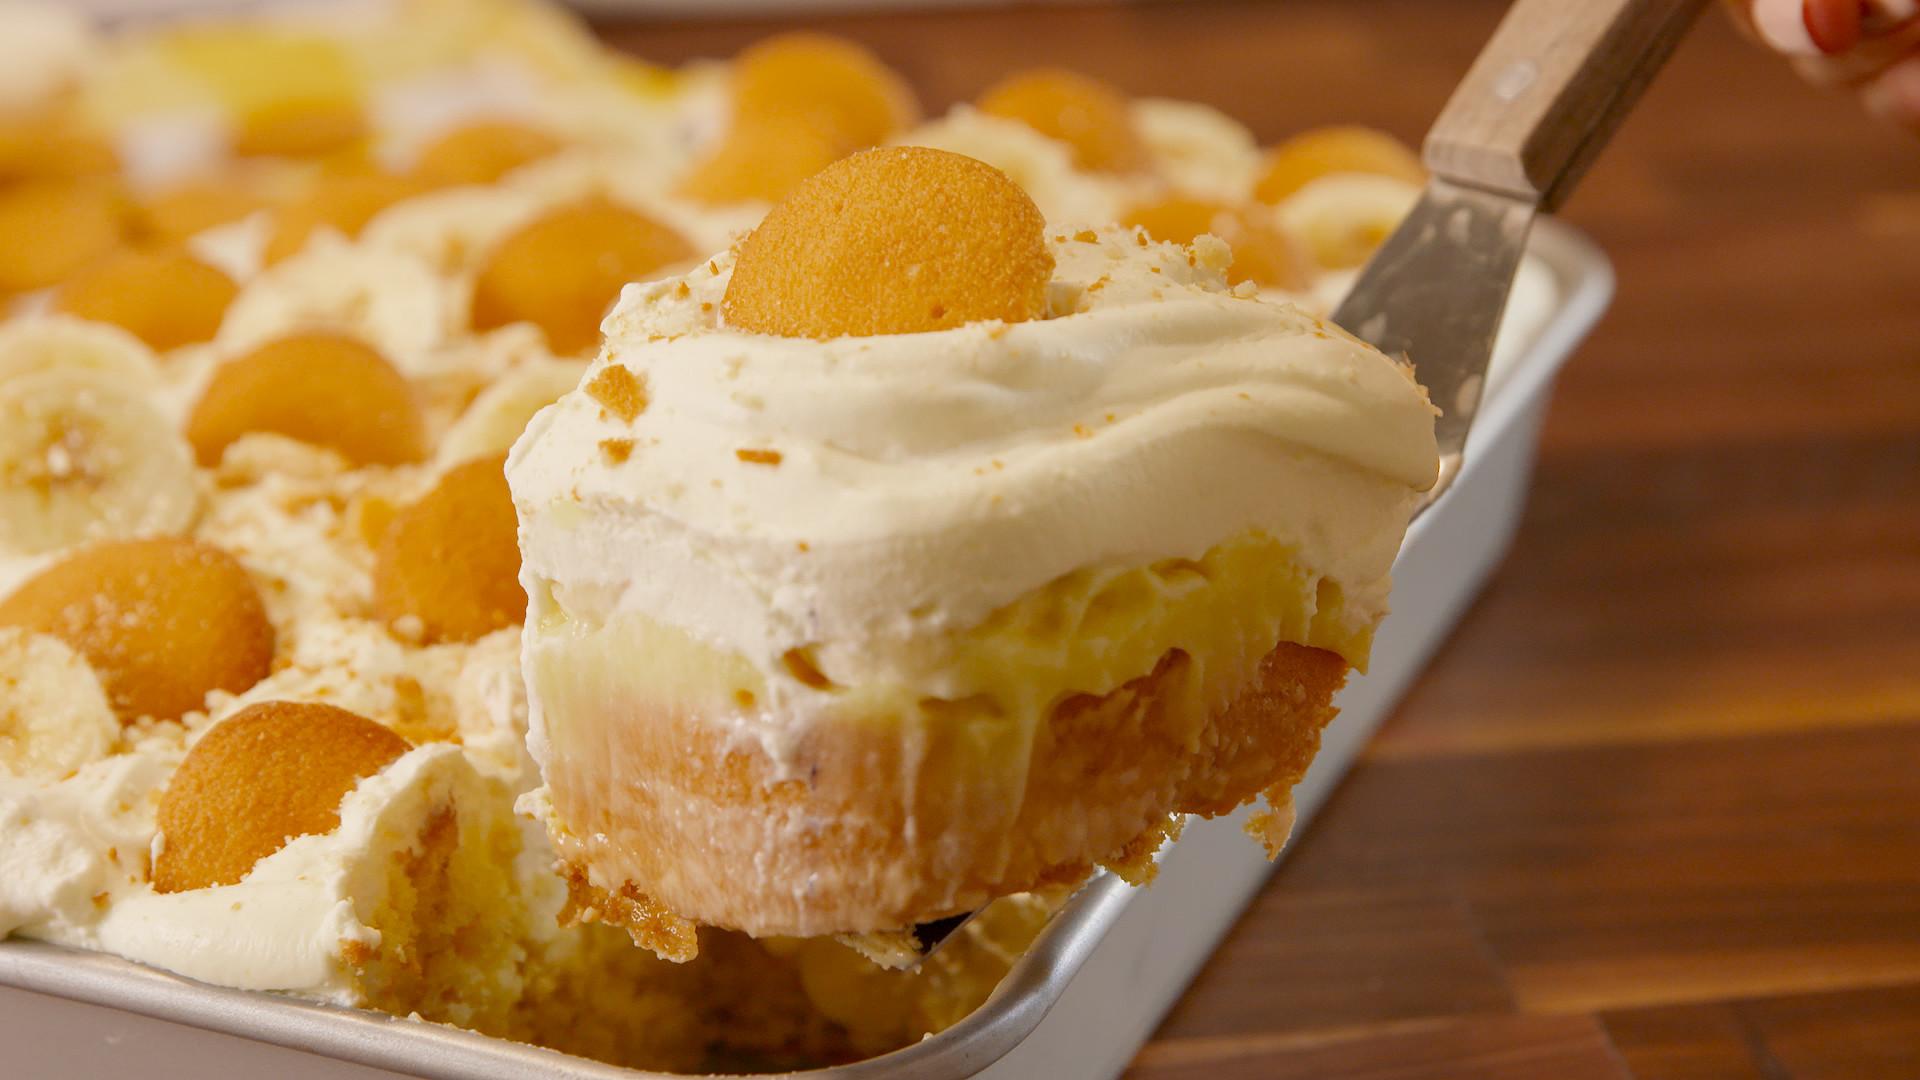 Quick Desserts Recipes  70 Easy Dessert Recipes – Ideas for Easiest Homemade